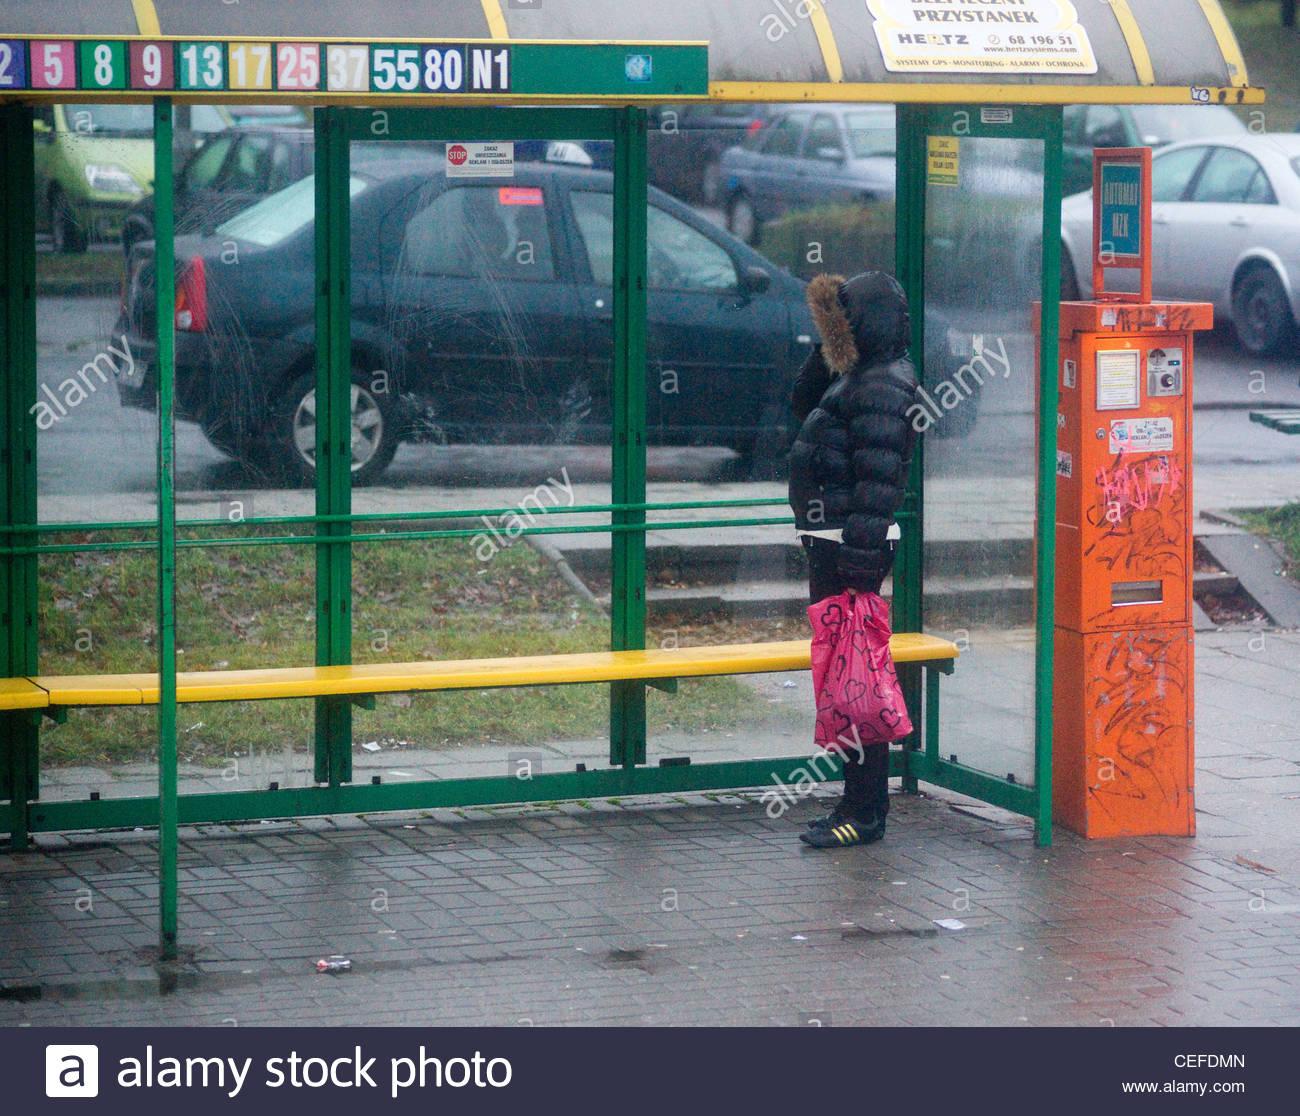 poland wroklaw tram trams tr - Stock Image